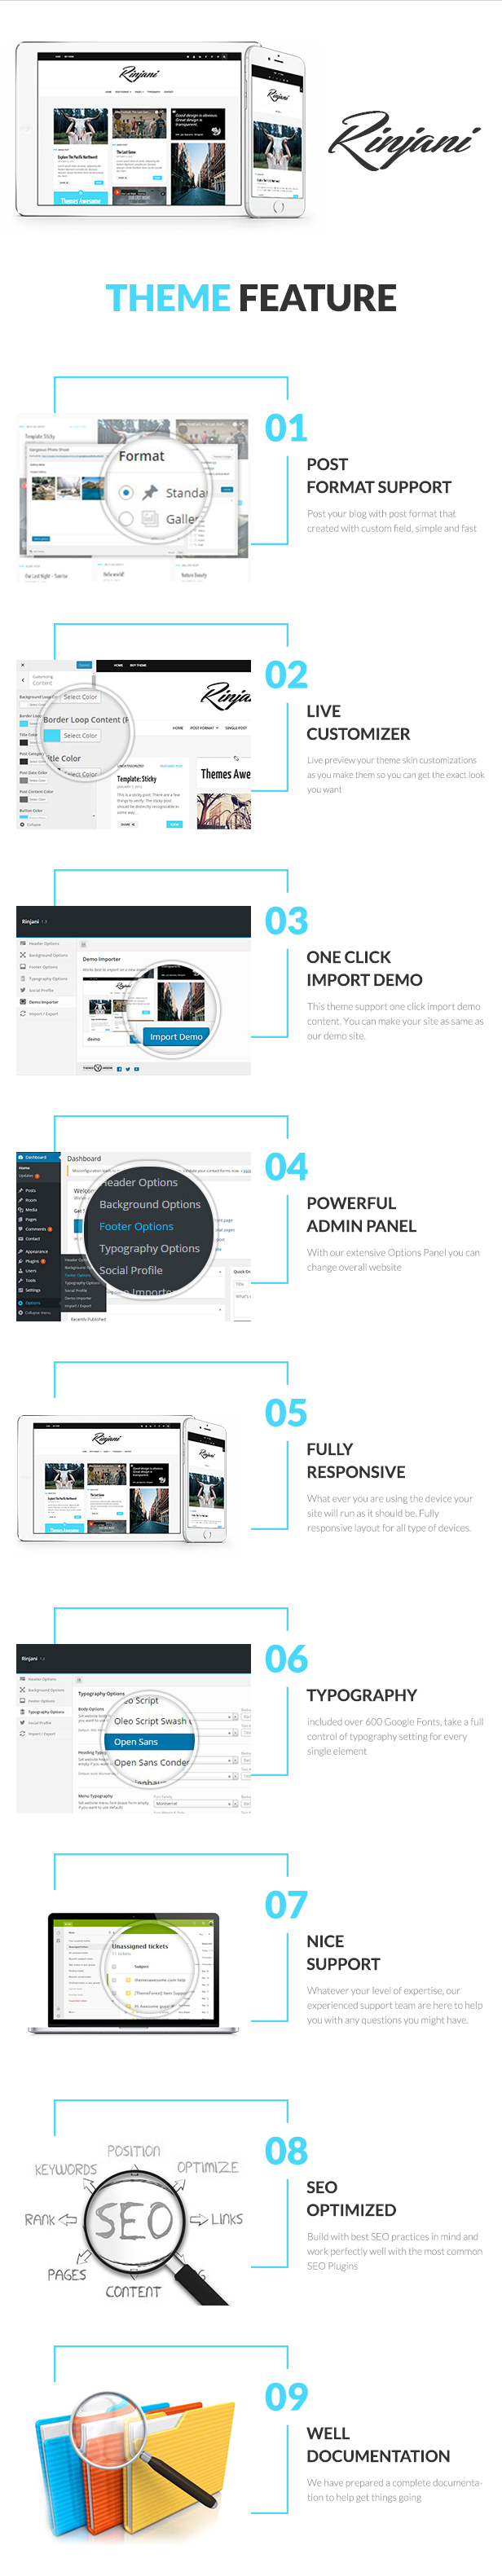 A Responsive Grid Blog Theme - Rinjani - 1